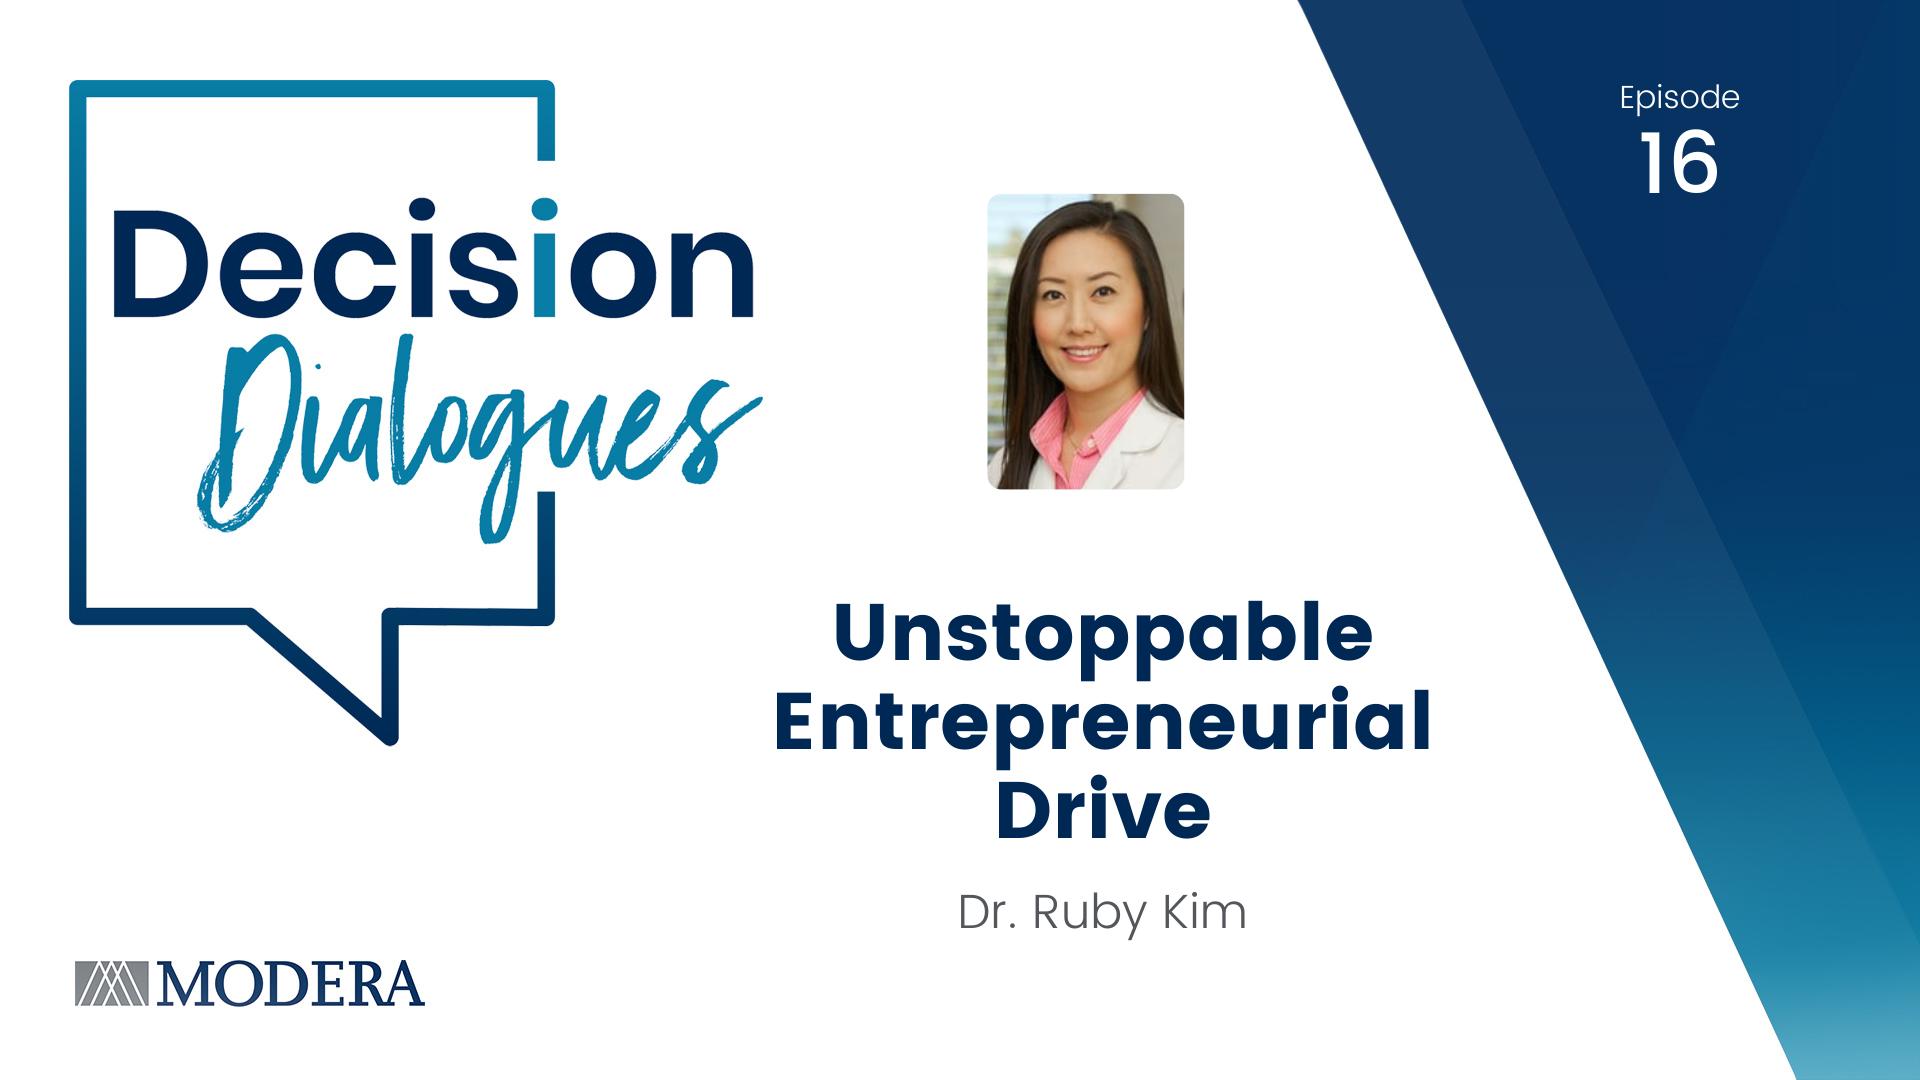 Decision Dialogues Ep 16 - Dr. Ruby Kim